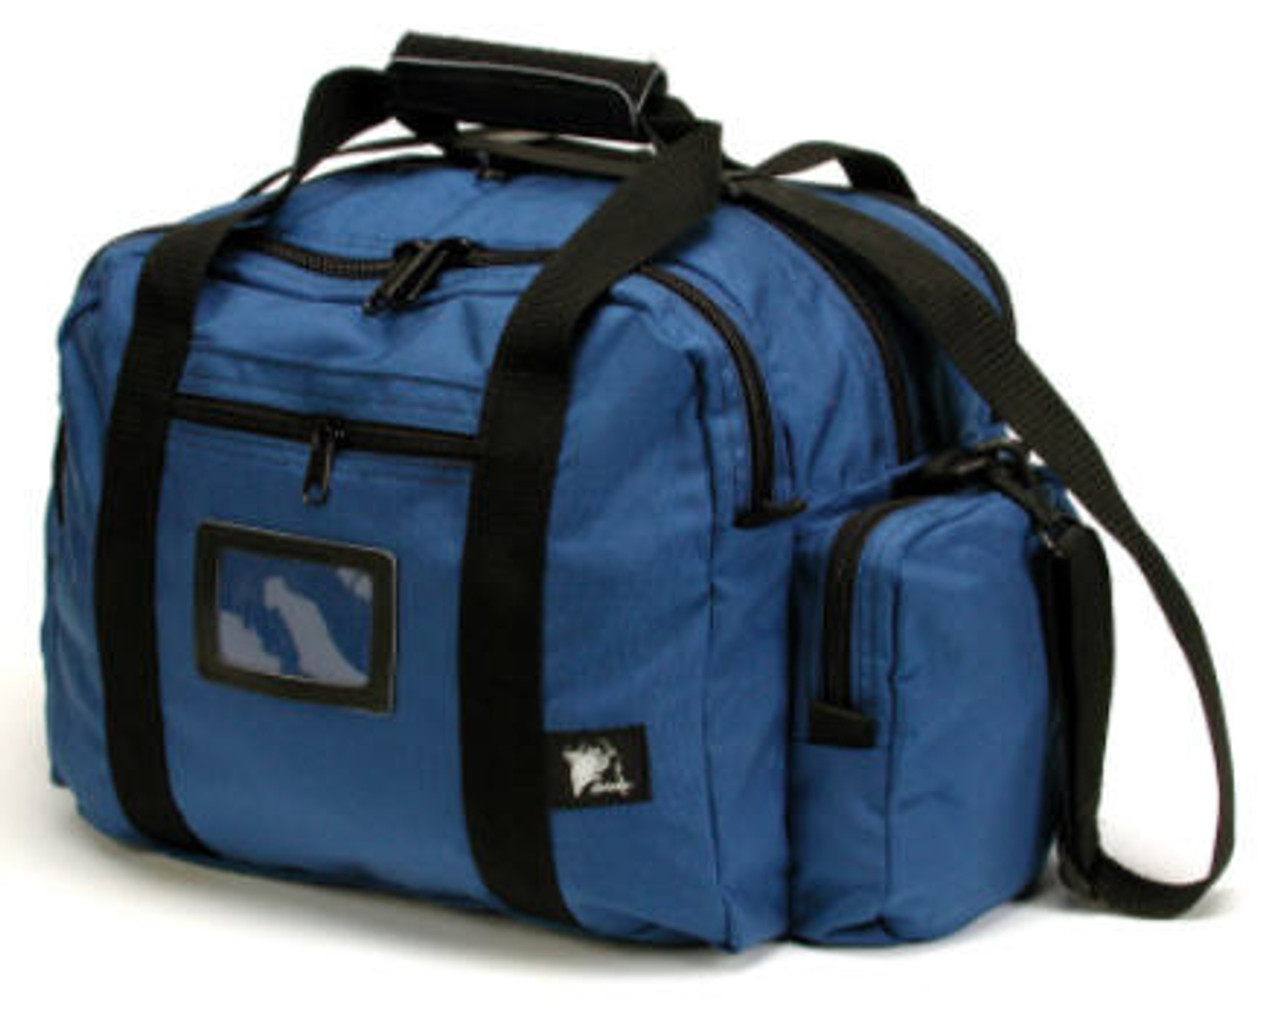 Mini-Smokey Bag by Hawke - All Colors